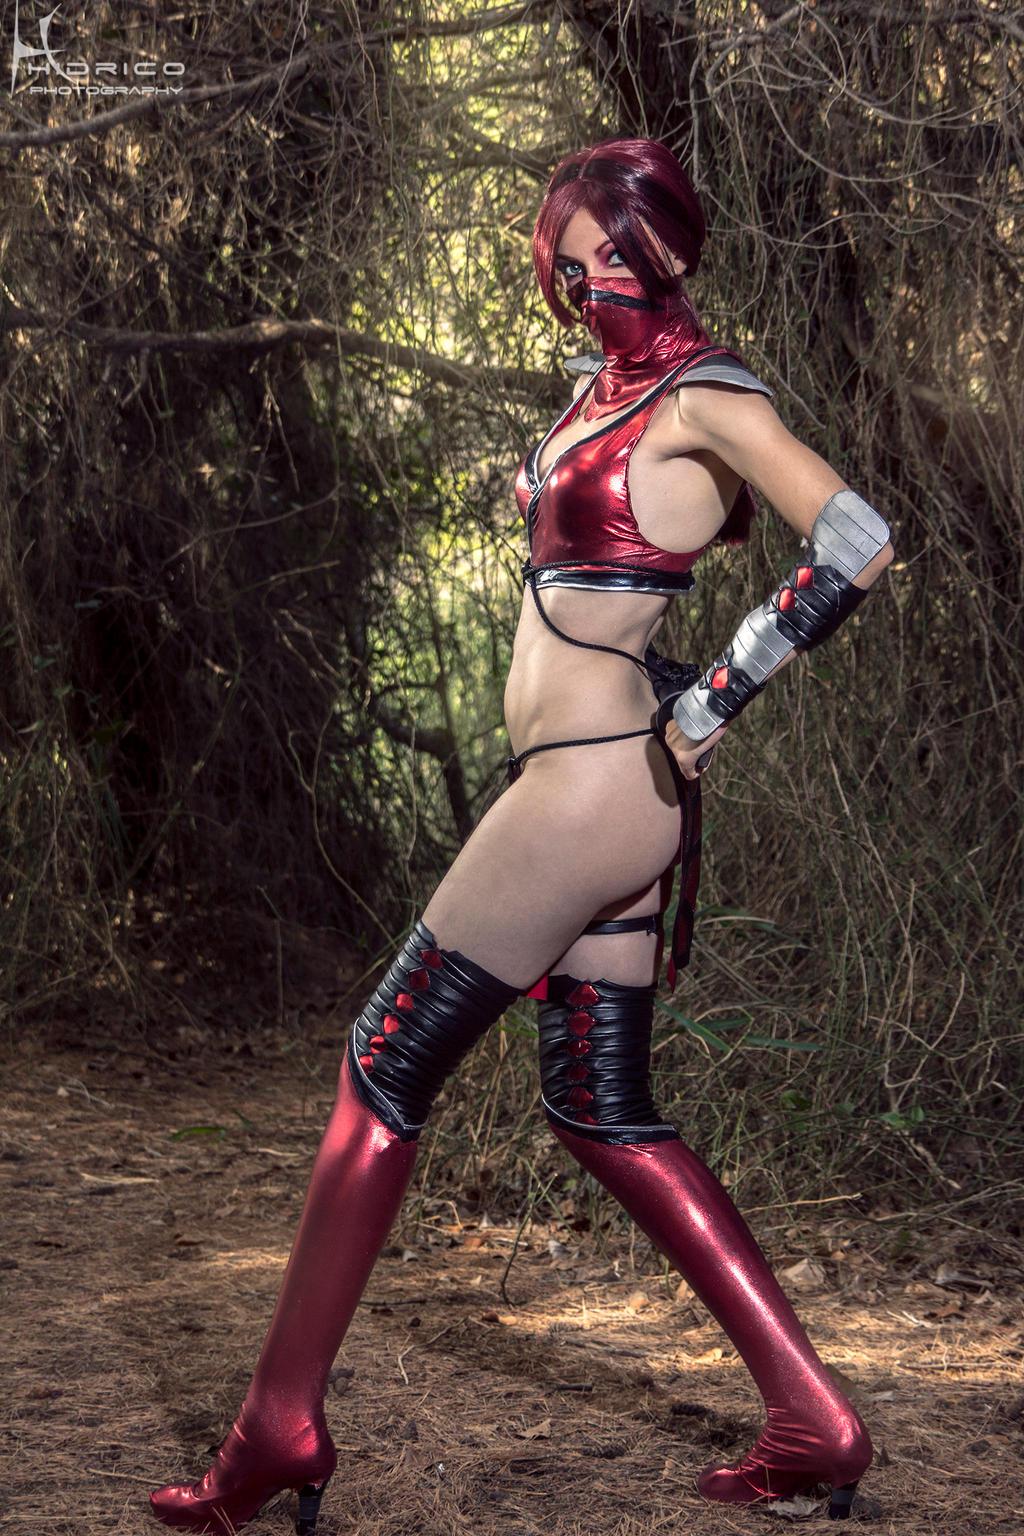 Skarlet - Mortal Kombat 9 - 4 by Hidrico